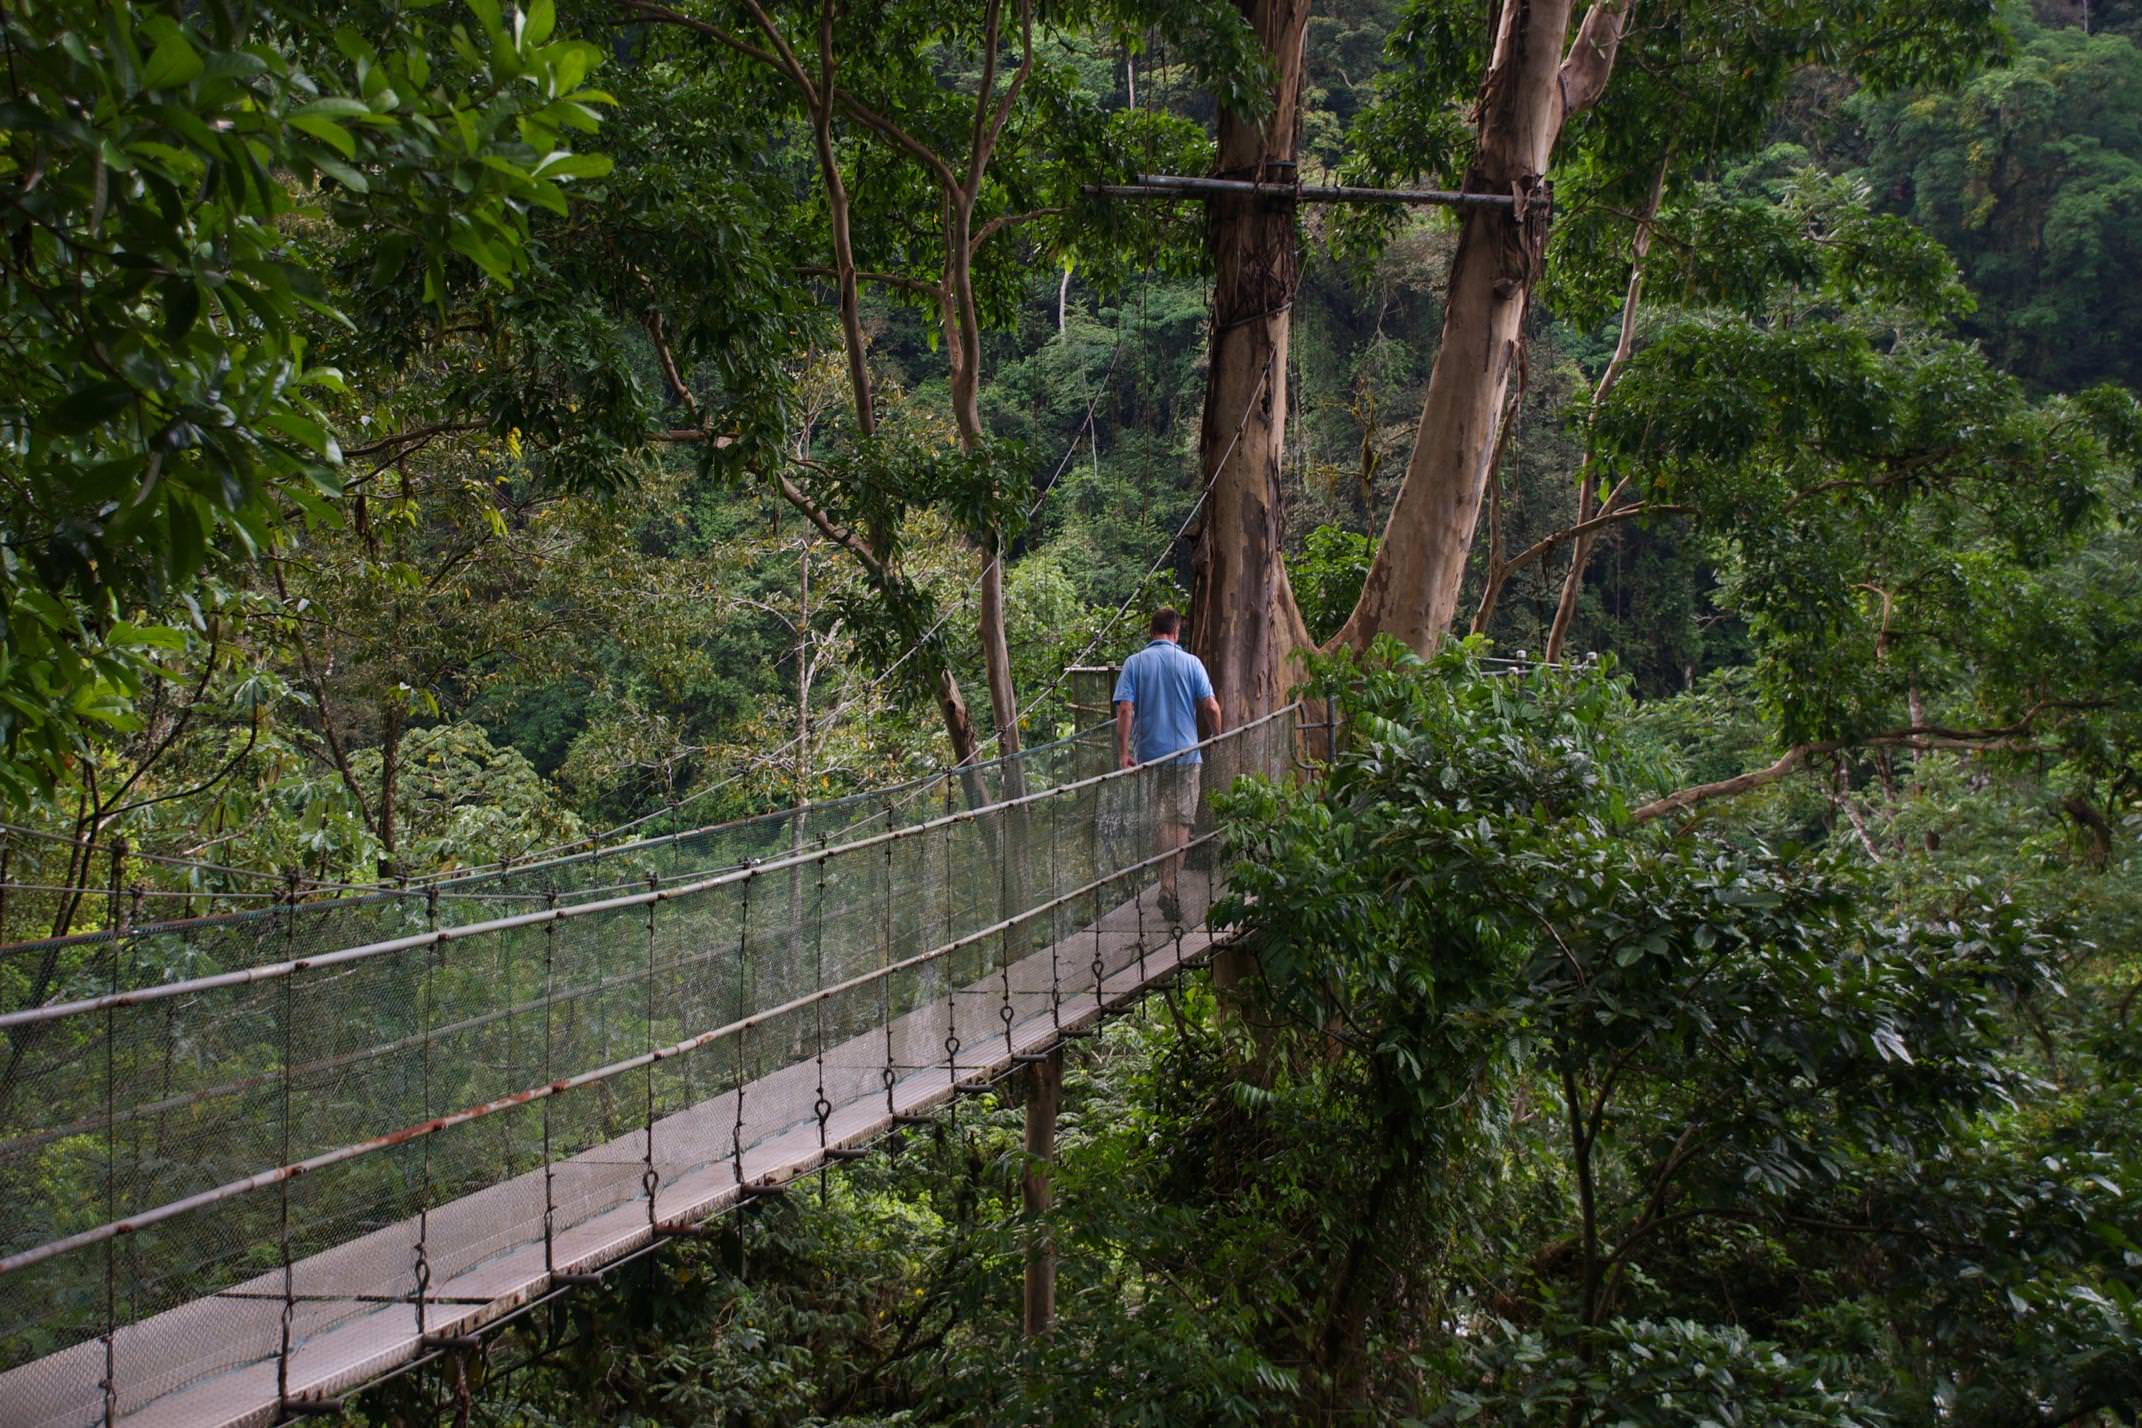 Costa rica pacuare lodge walking across canopy walkway